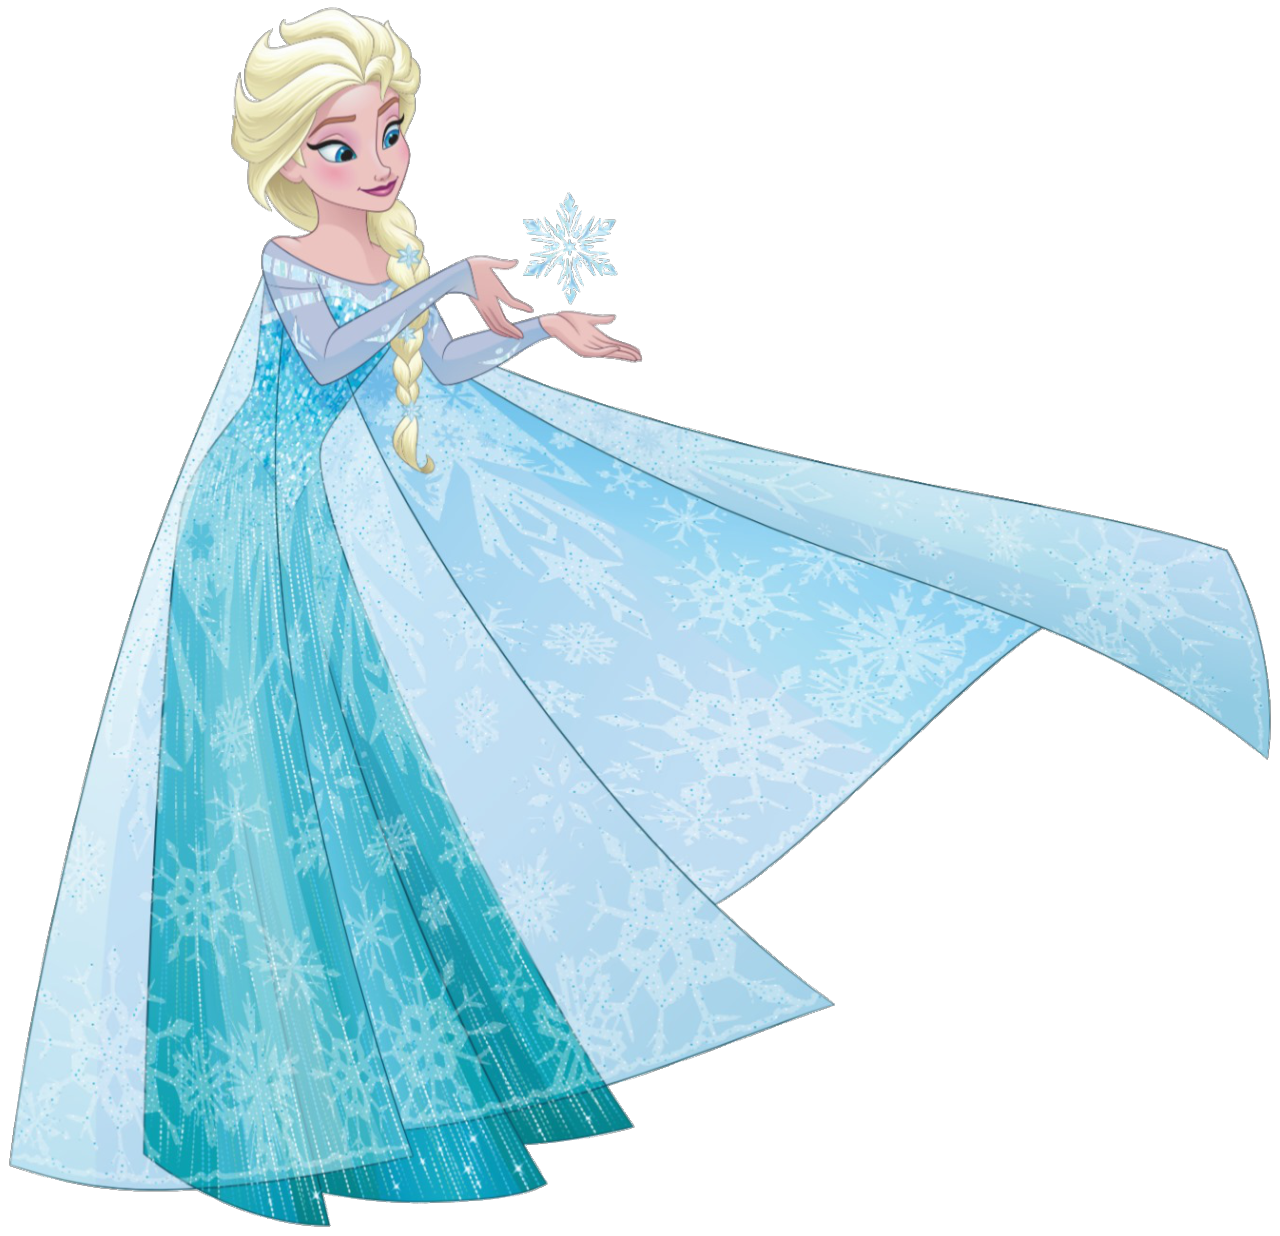 Disney Princess Artworks/PNG Disney princess pictures